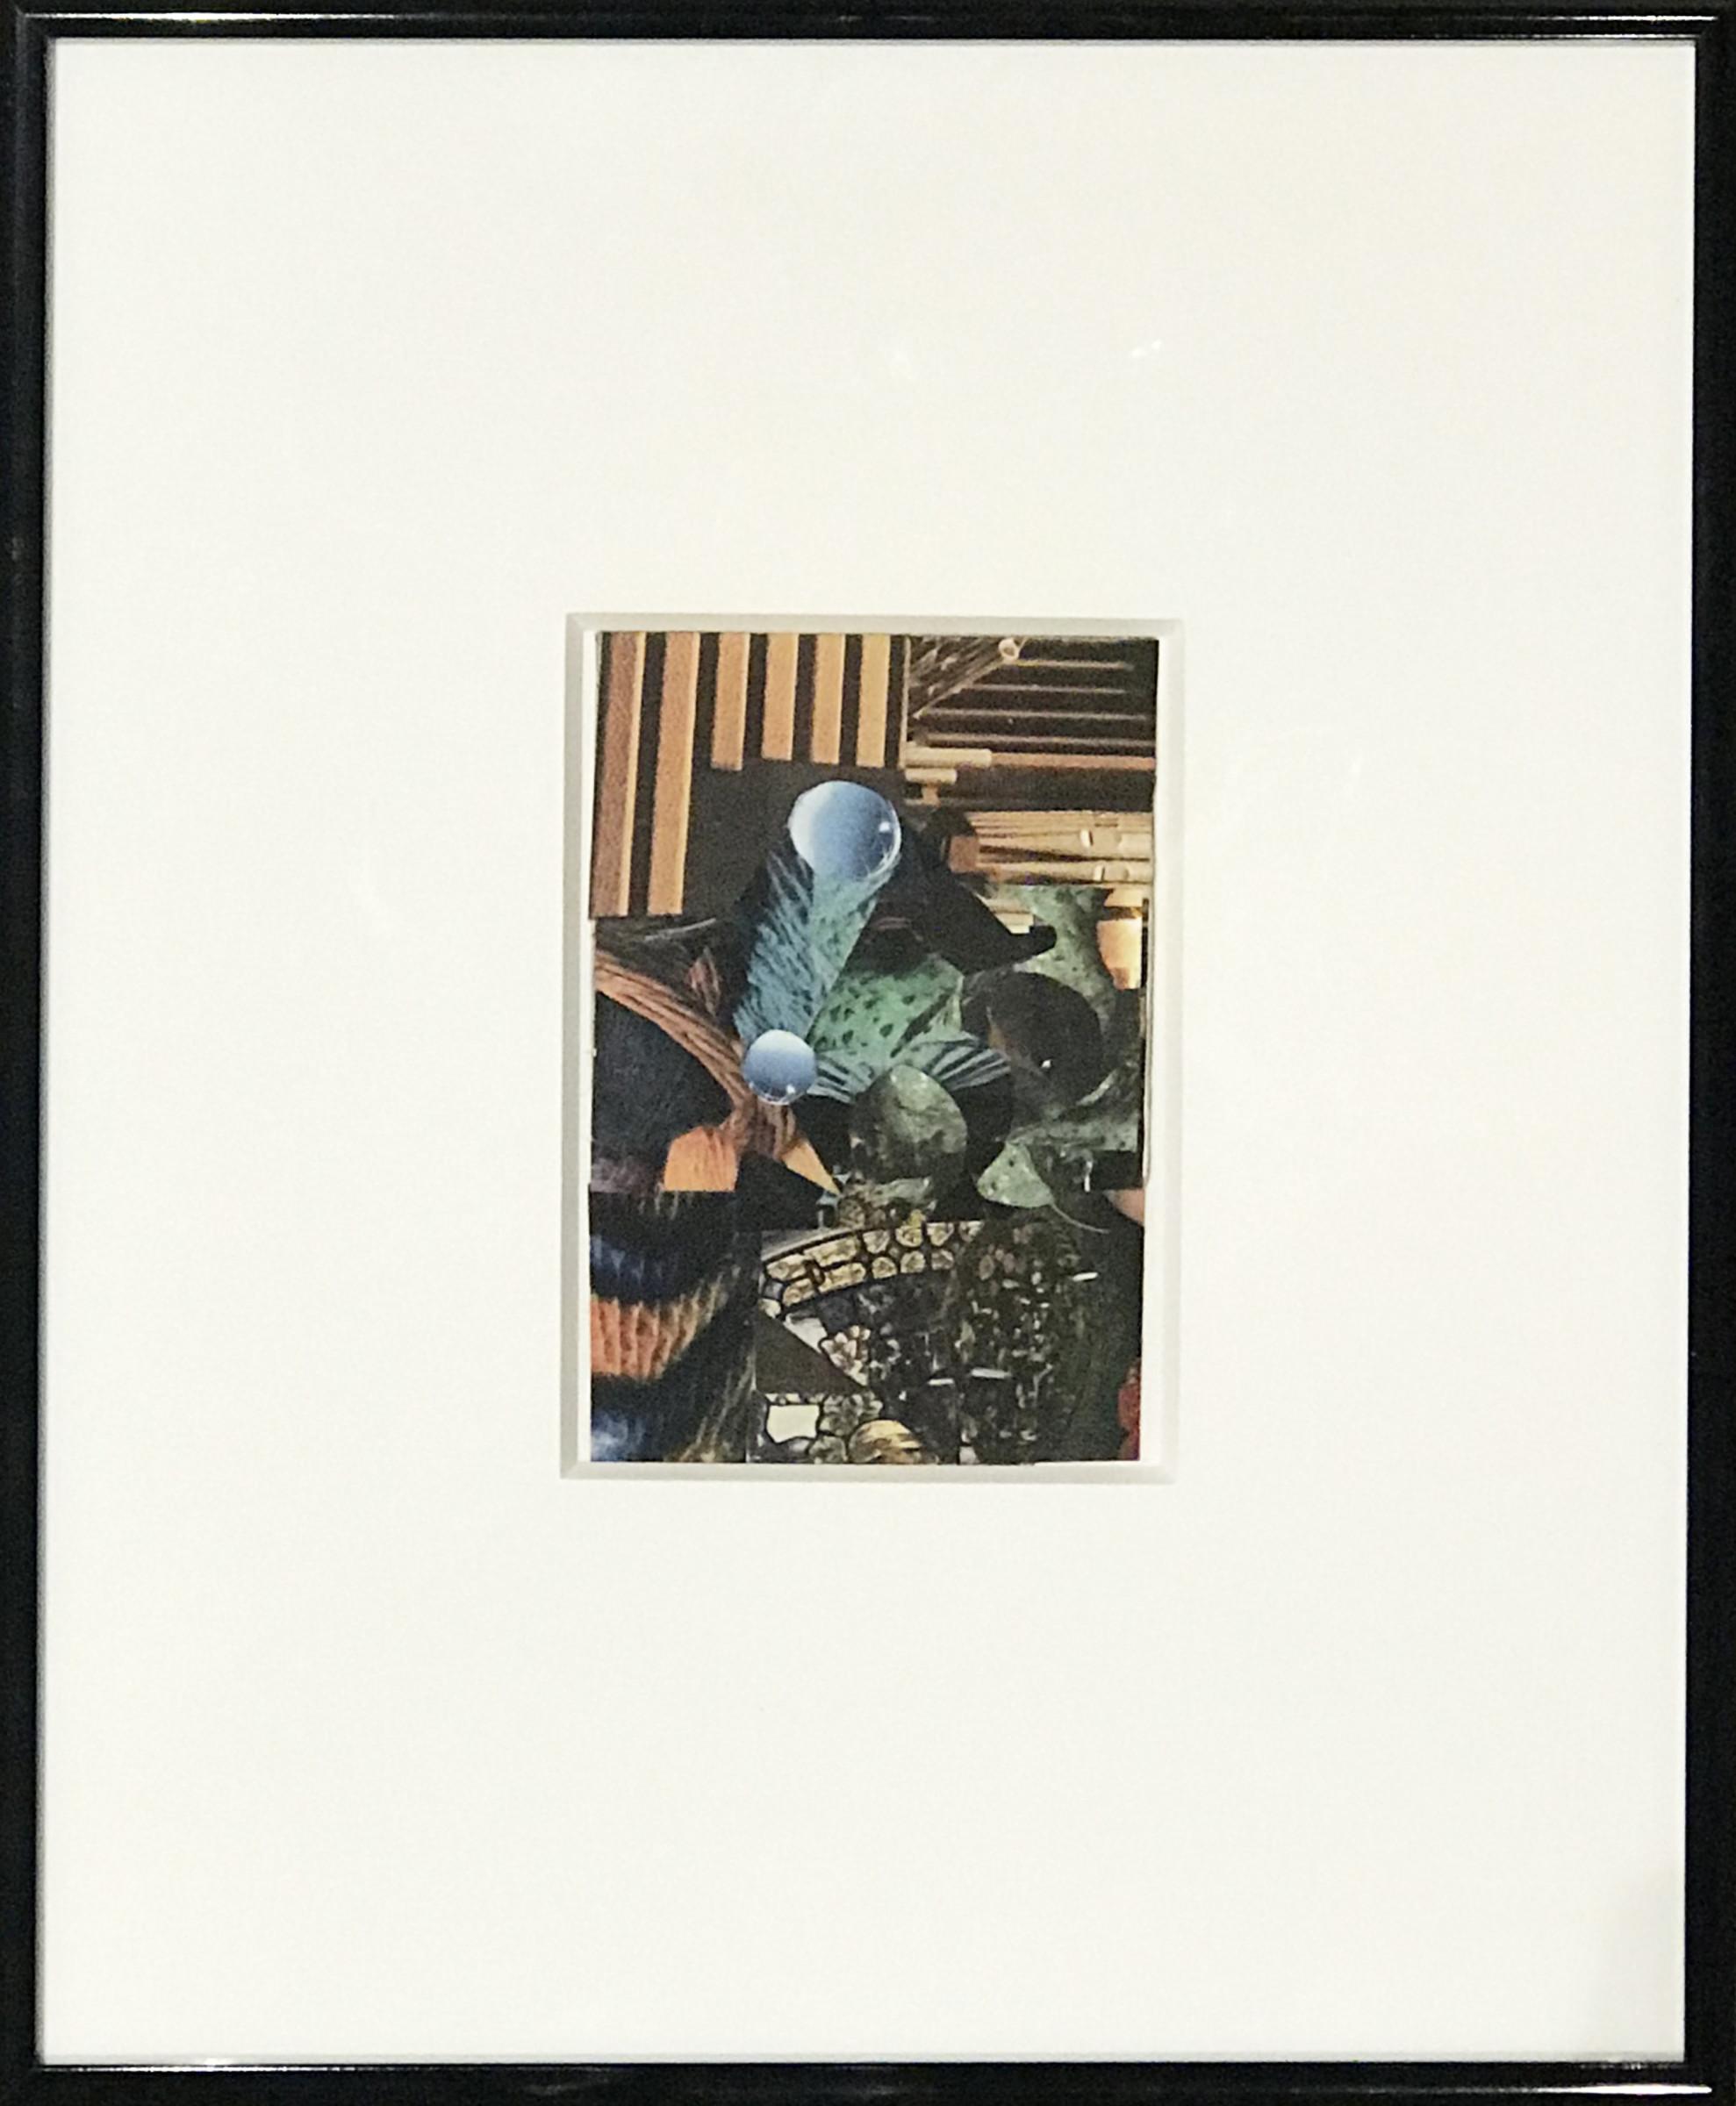 <span class=&#34;link fancybox-details-link&#34;><a href=&#34;/artworks/311-jesse-lott-untitled/&#34;>View Detail Page</a></span><div class=&#34;artist&#34;><strong>Jesse Lott</strong></div> <div class=&#34;title&#34;>Untitled</div> <div class=&#34;medium&#34;>Mixed Media</div> <div class=&#34;dimensions&#34;>3 1/2 x 2 1/2 in<br /> 8.9 x 6.3 cm</div>